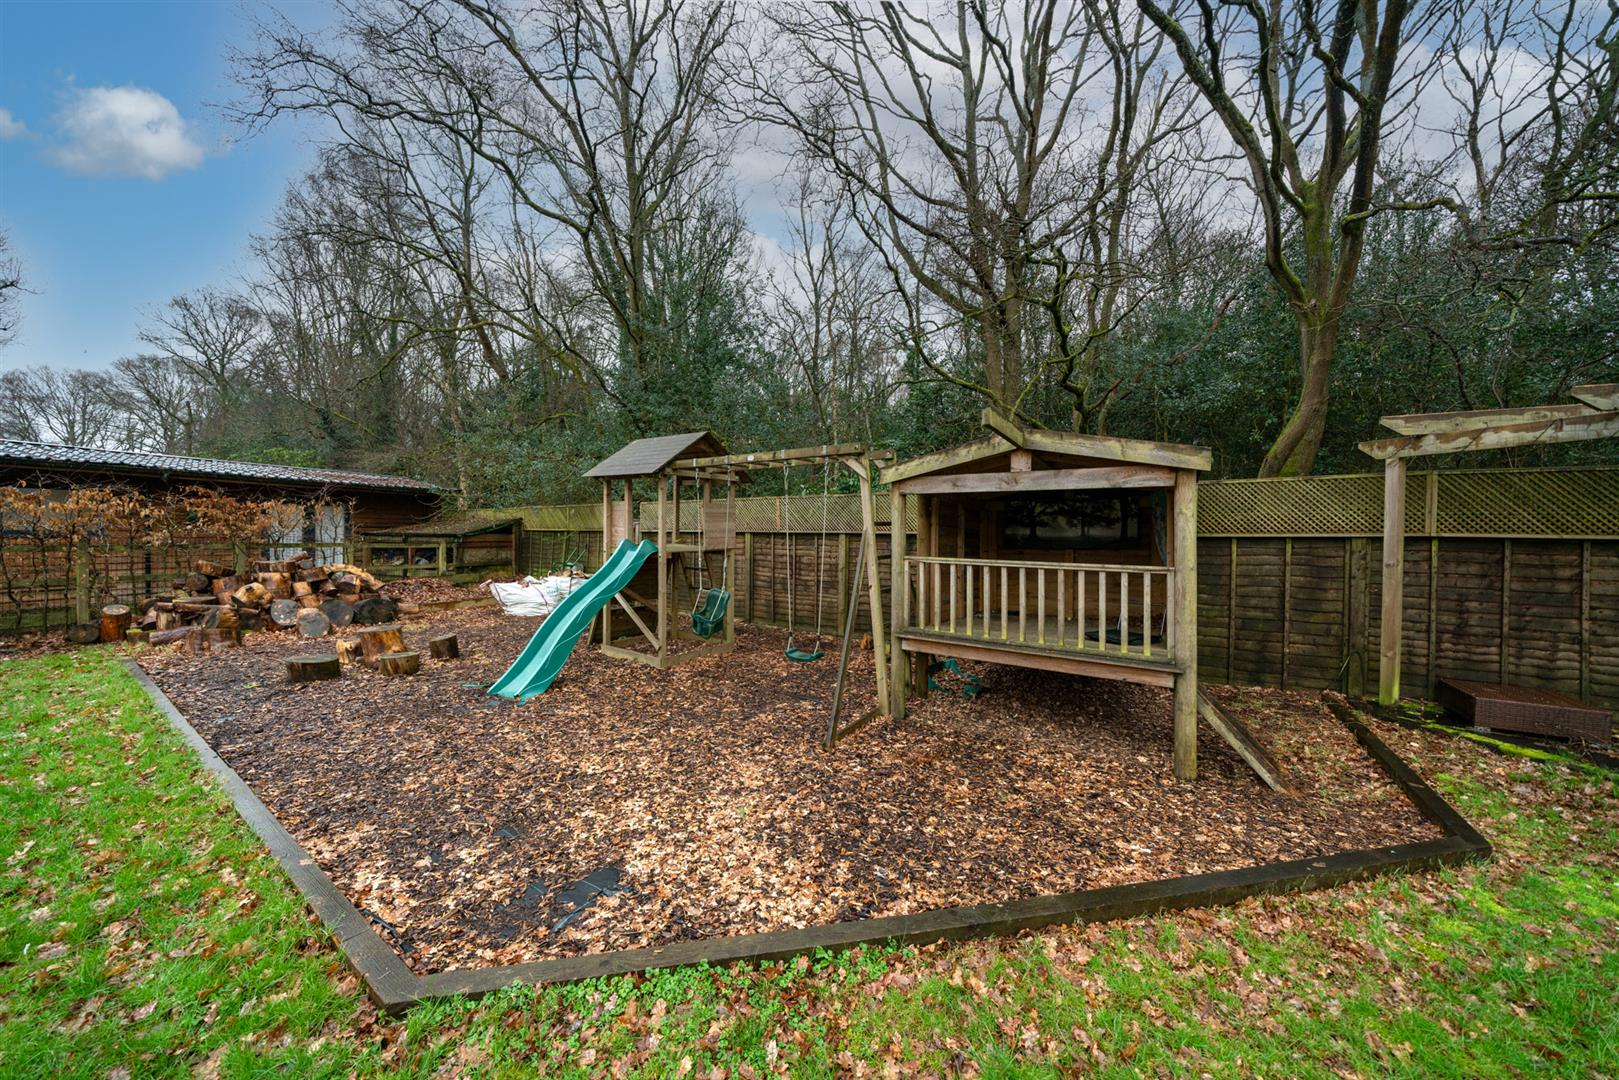 15-Hedgeside-6 - garden play area.jpg